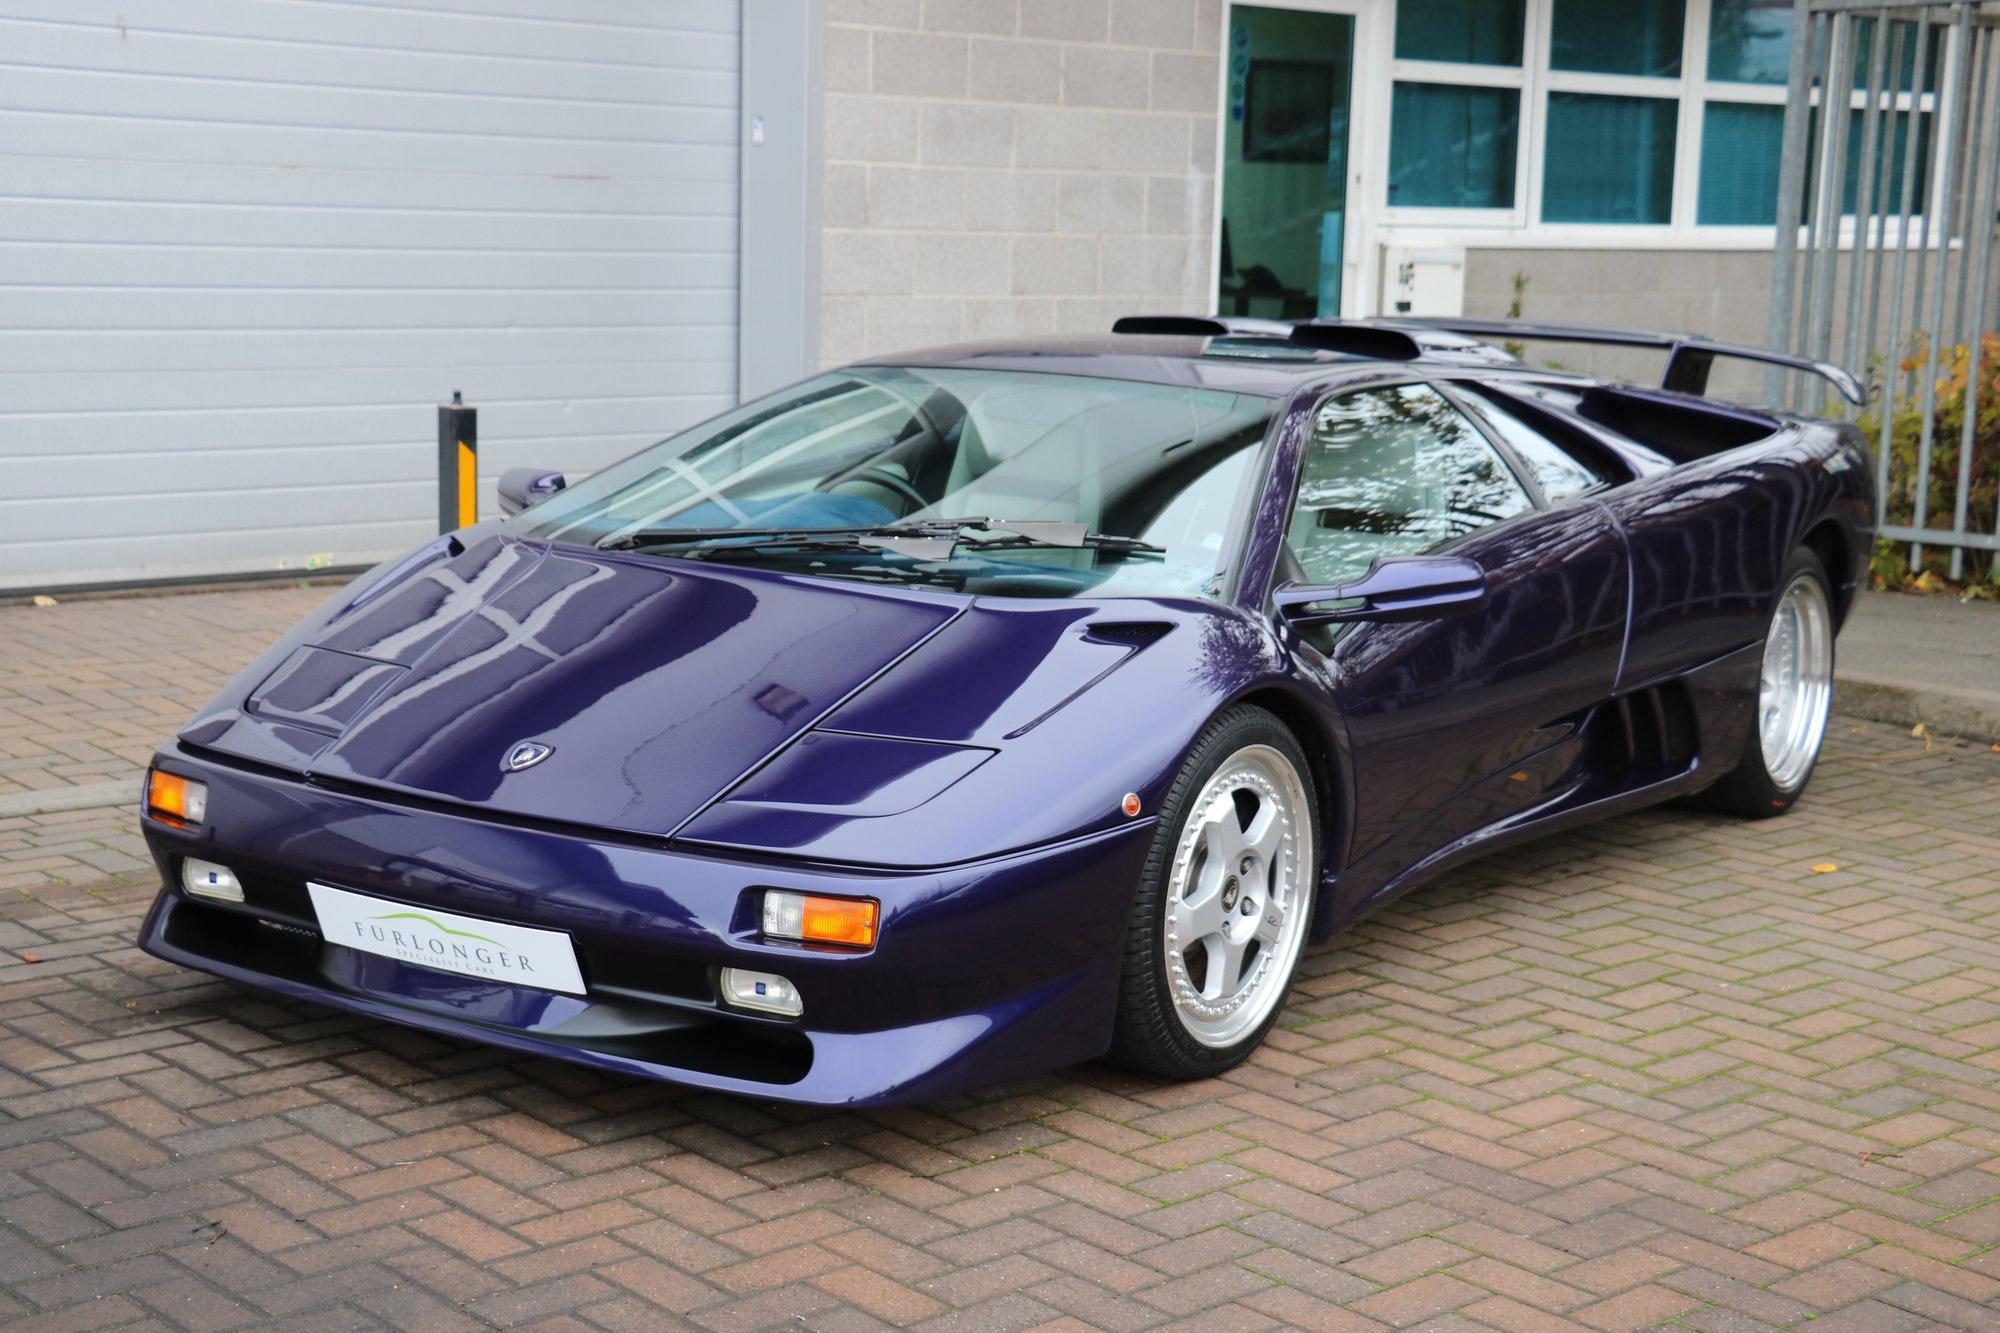 1998 Lamborghini Diablo Sv Rwd